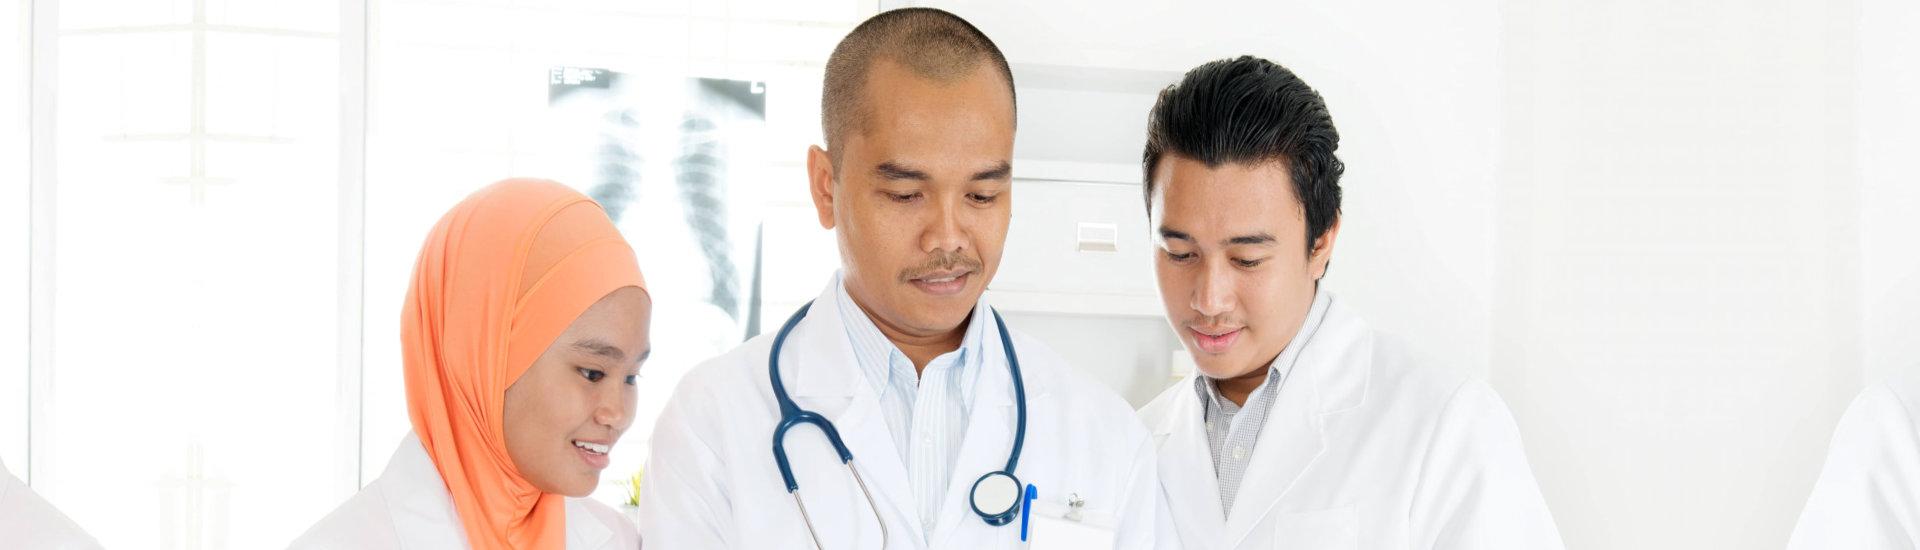 medical staffs reading something